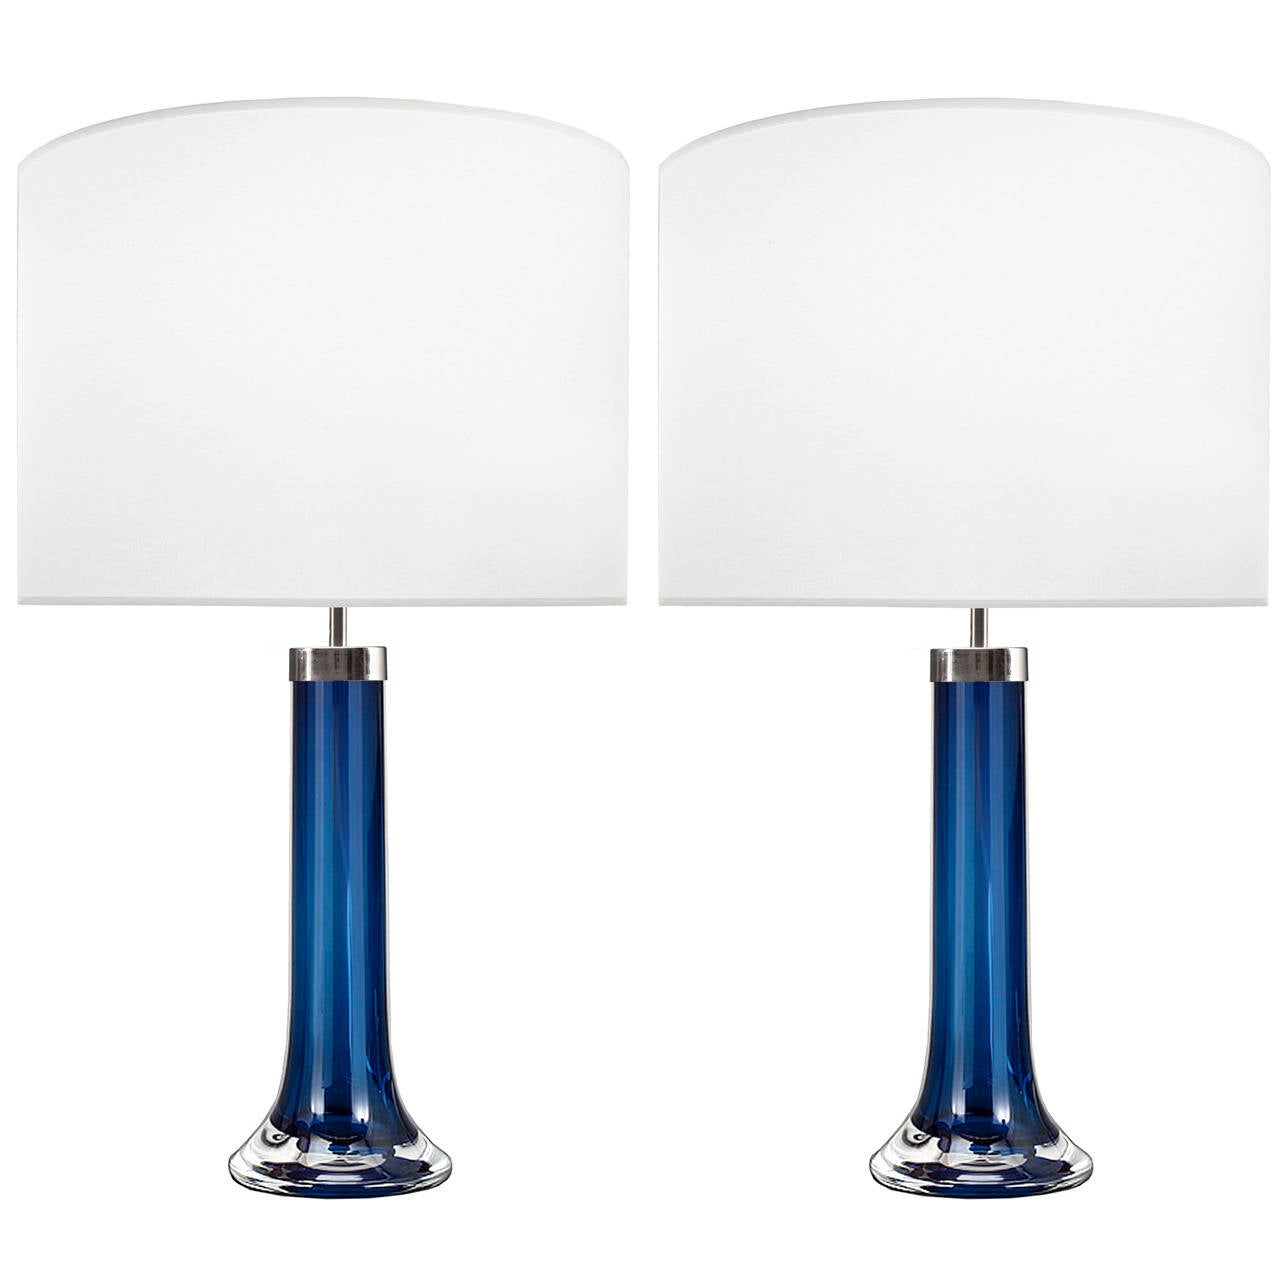 Pair of Johansfors Blue Glass Lamps